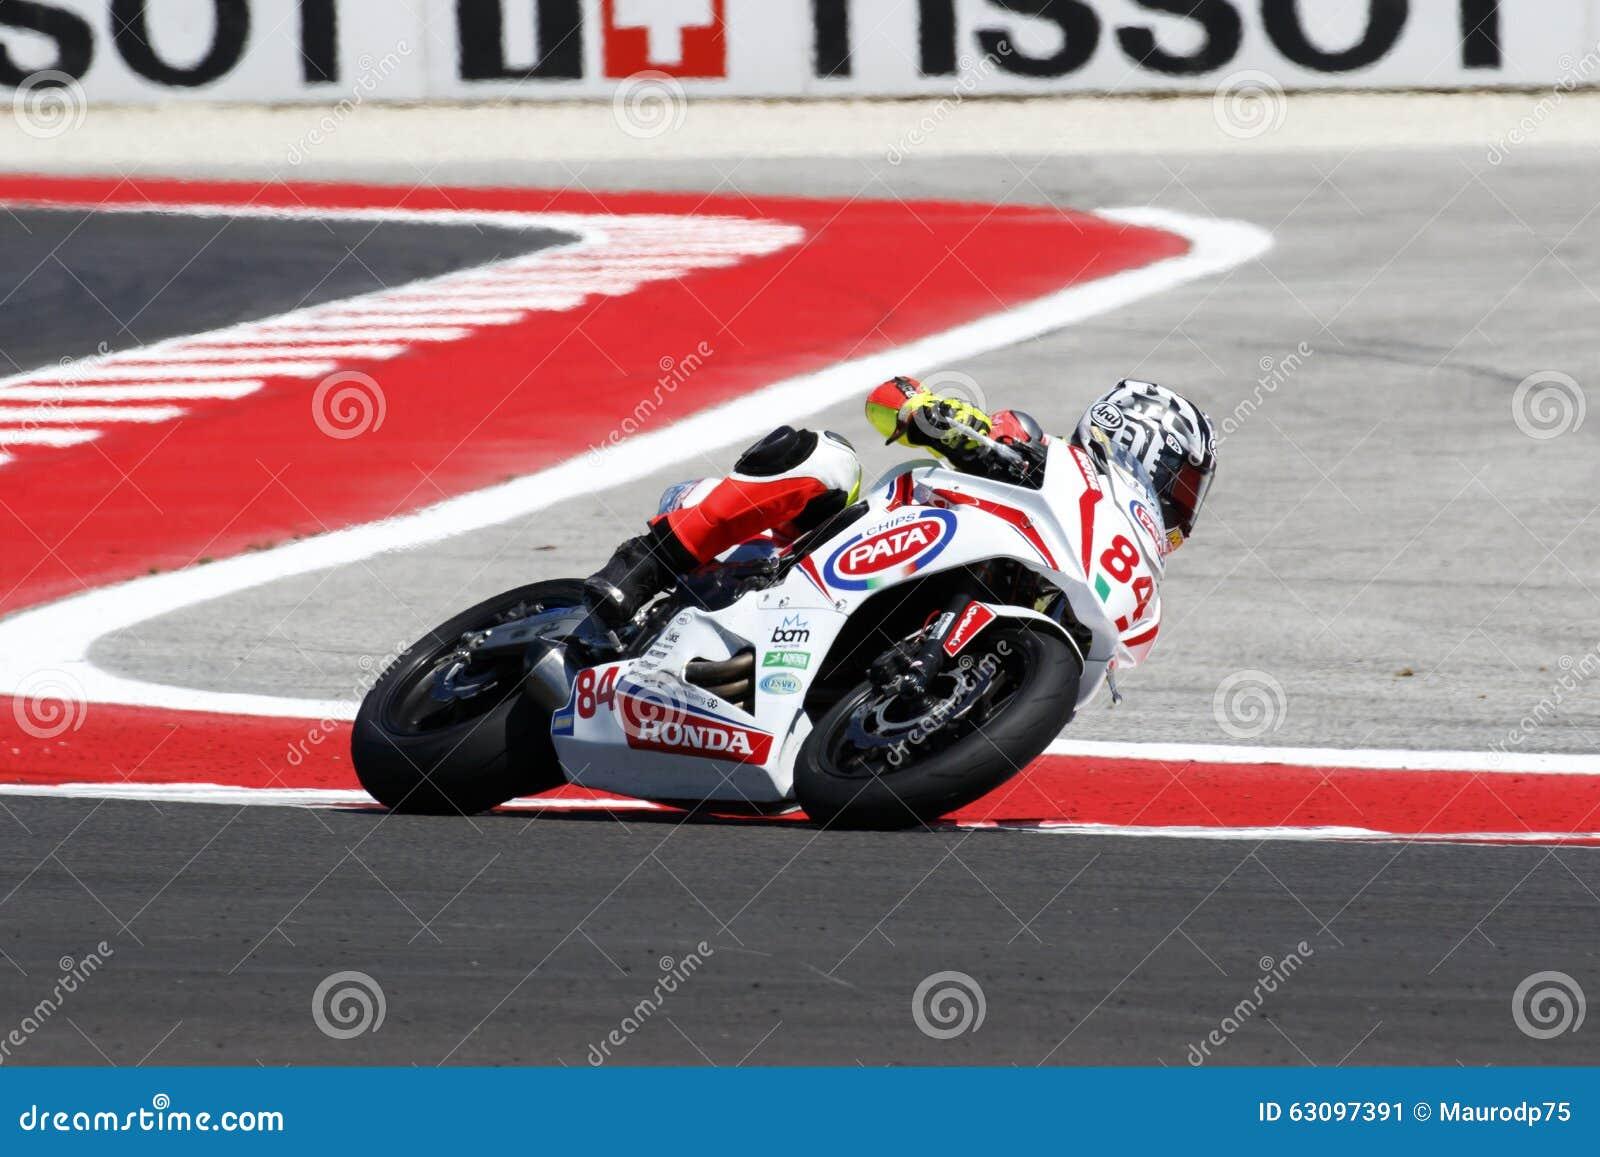 Misano Adriatico Italy  City pictures : ... at Misano World Circuit on June 21, 2015 in Misano Adriatico, Italy